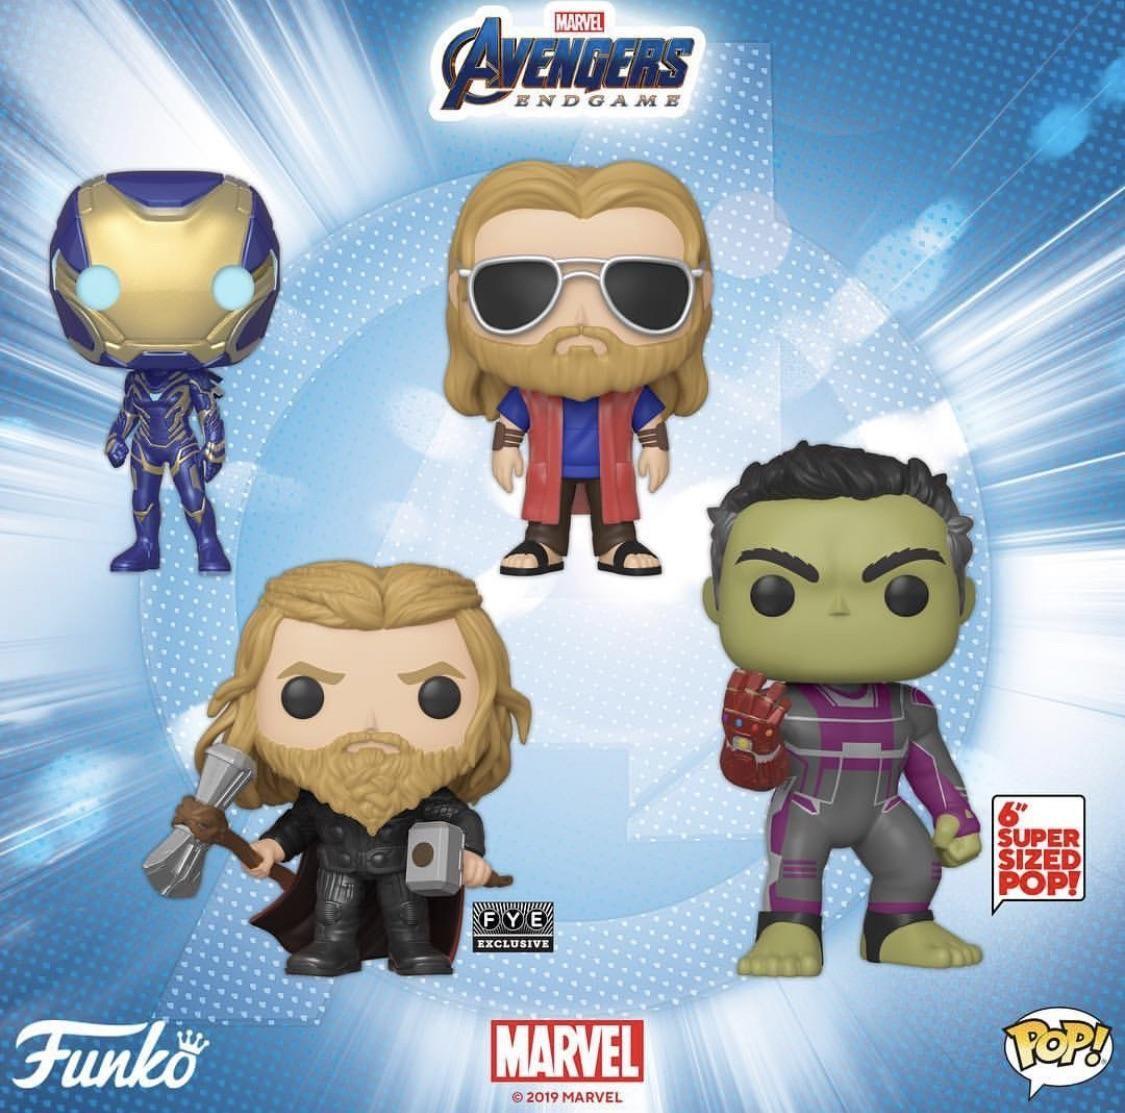 Avengers Endgame Funko Pop Vingadores Funko Pops Marvel Universe